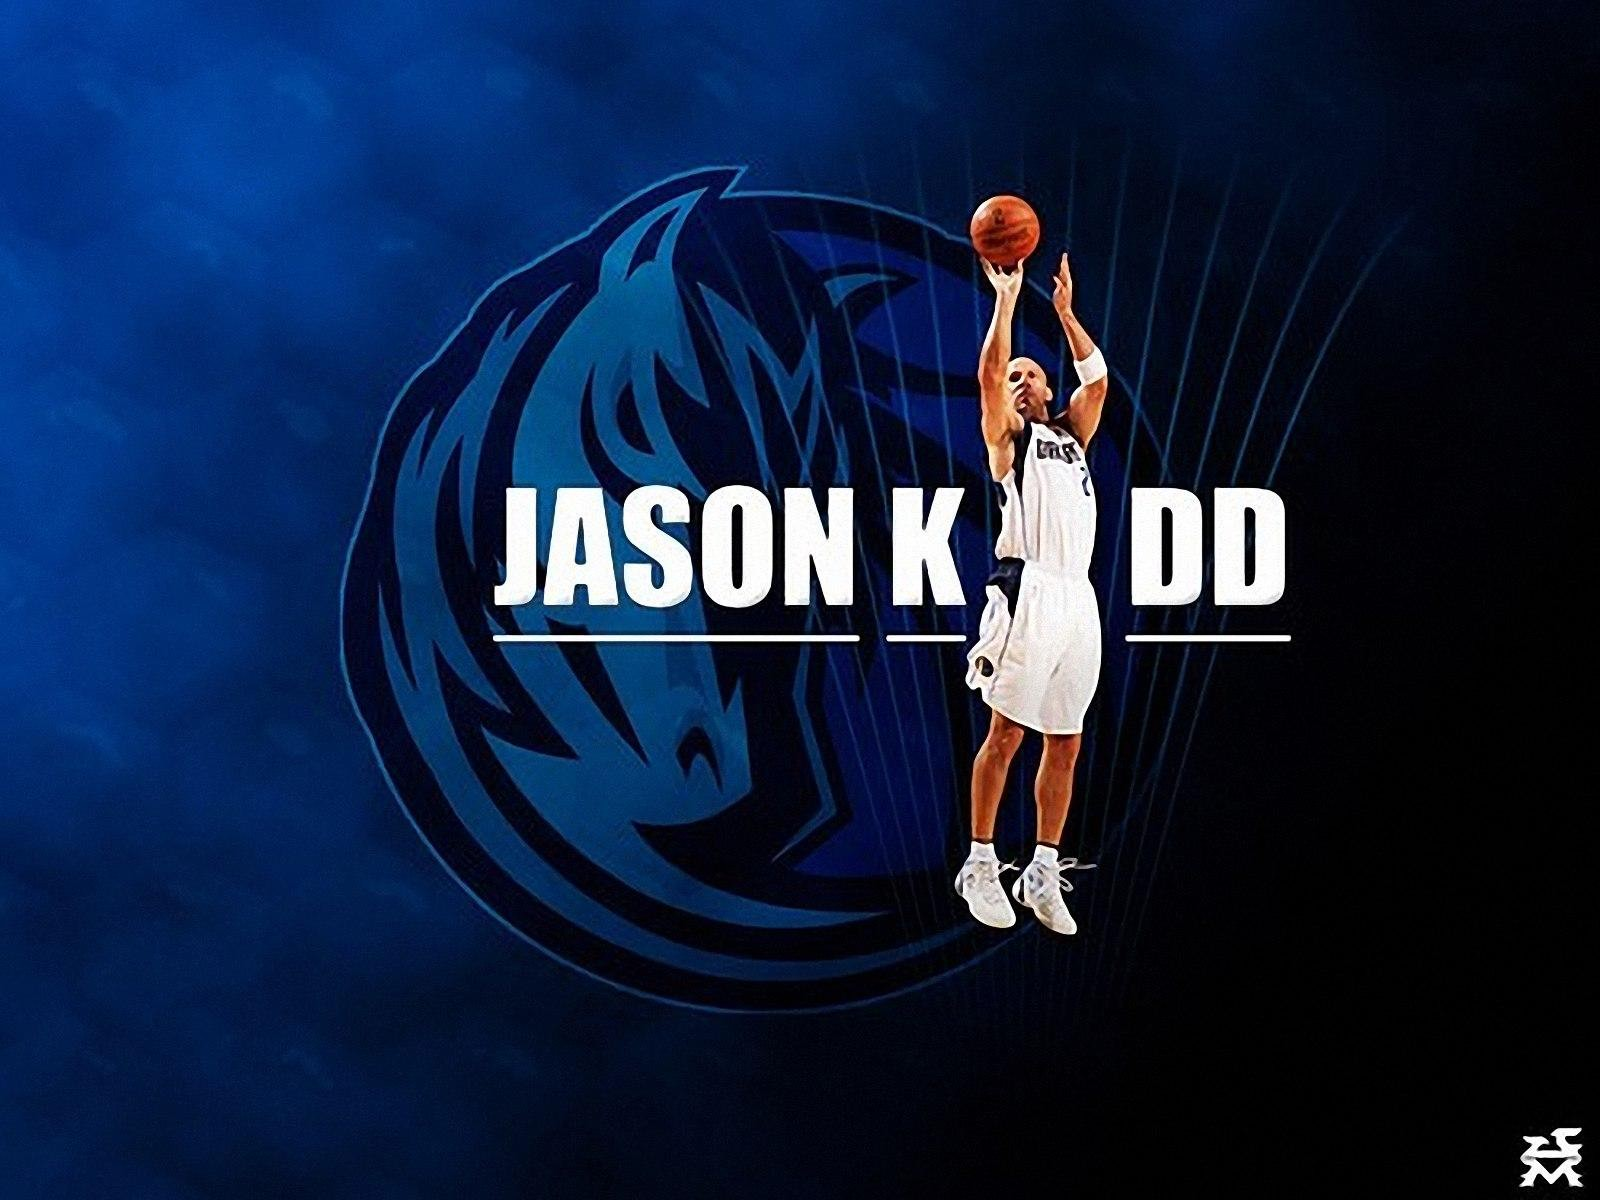 Jason kidd desktop background free subscribe jason kidd voltagebd Image collections